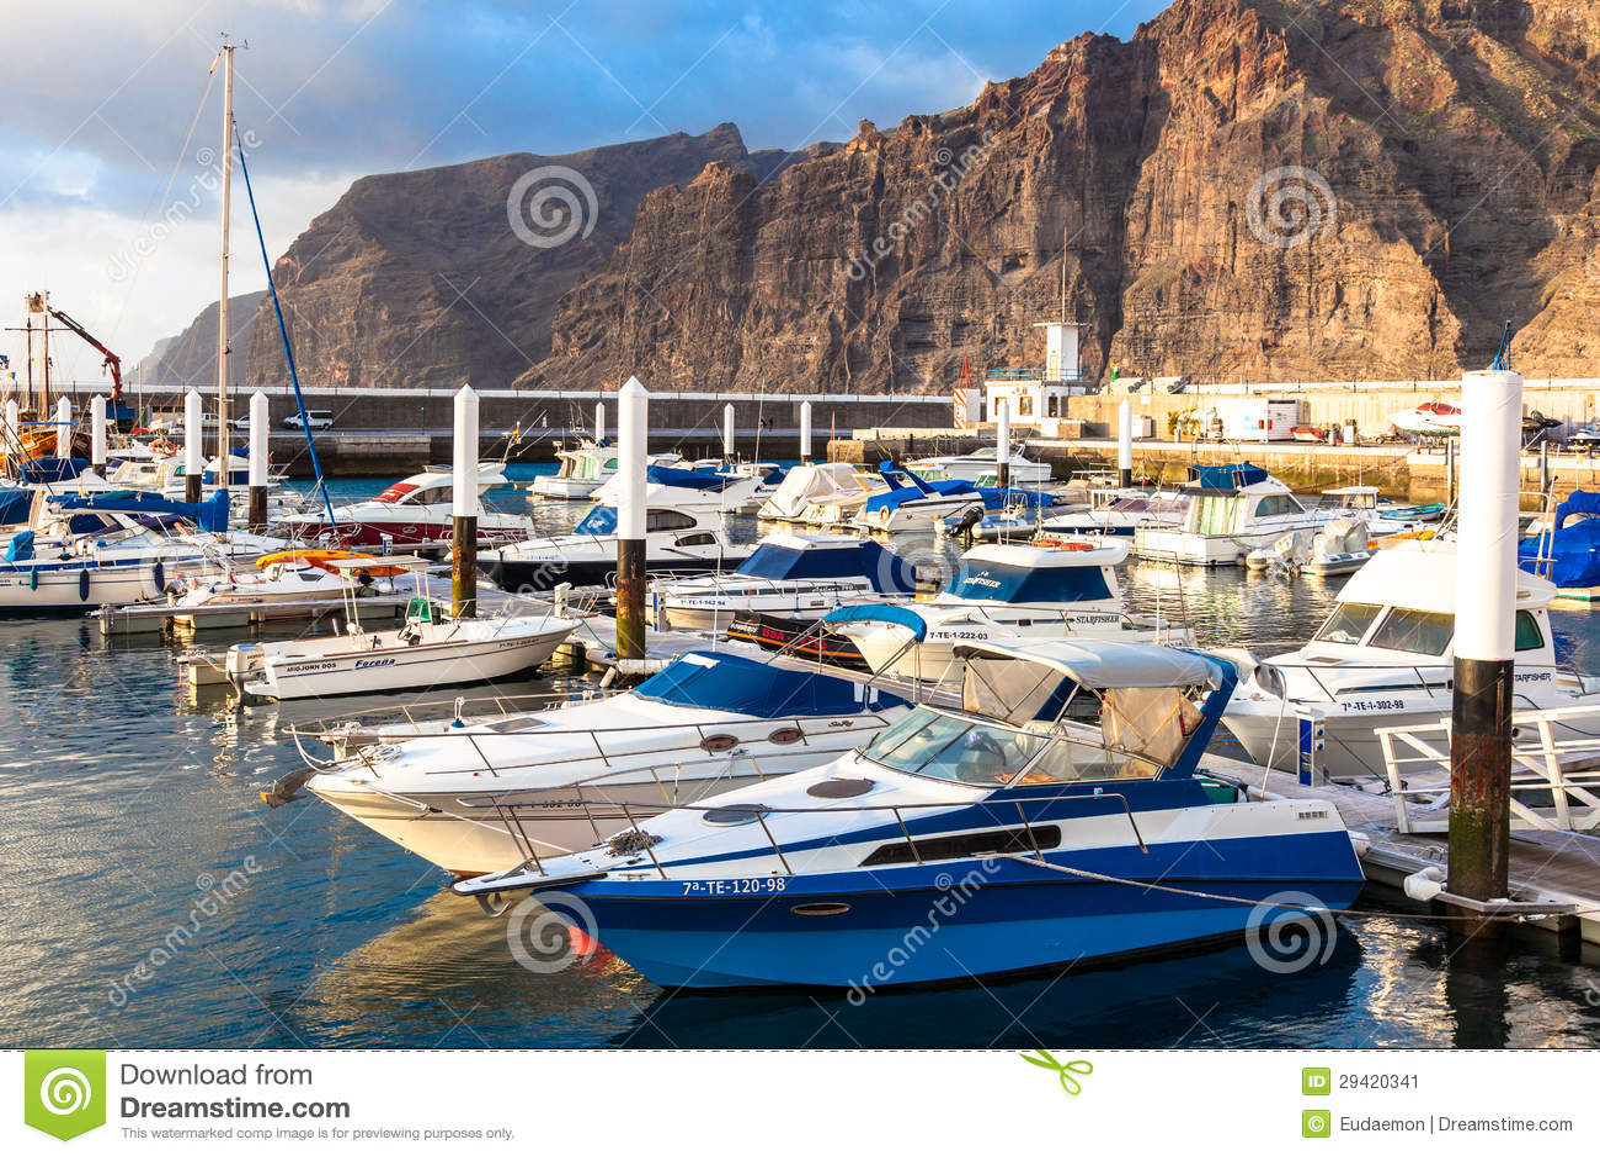 Marina at puerto de los gigantes tenerife spain editorial photo image 29420341 - Puerto de los gigantes ...